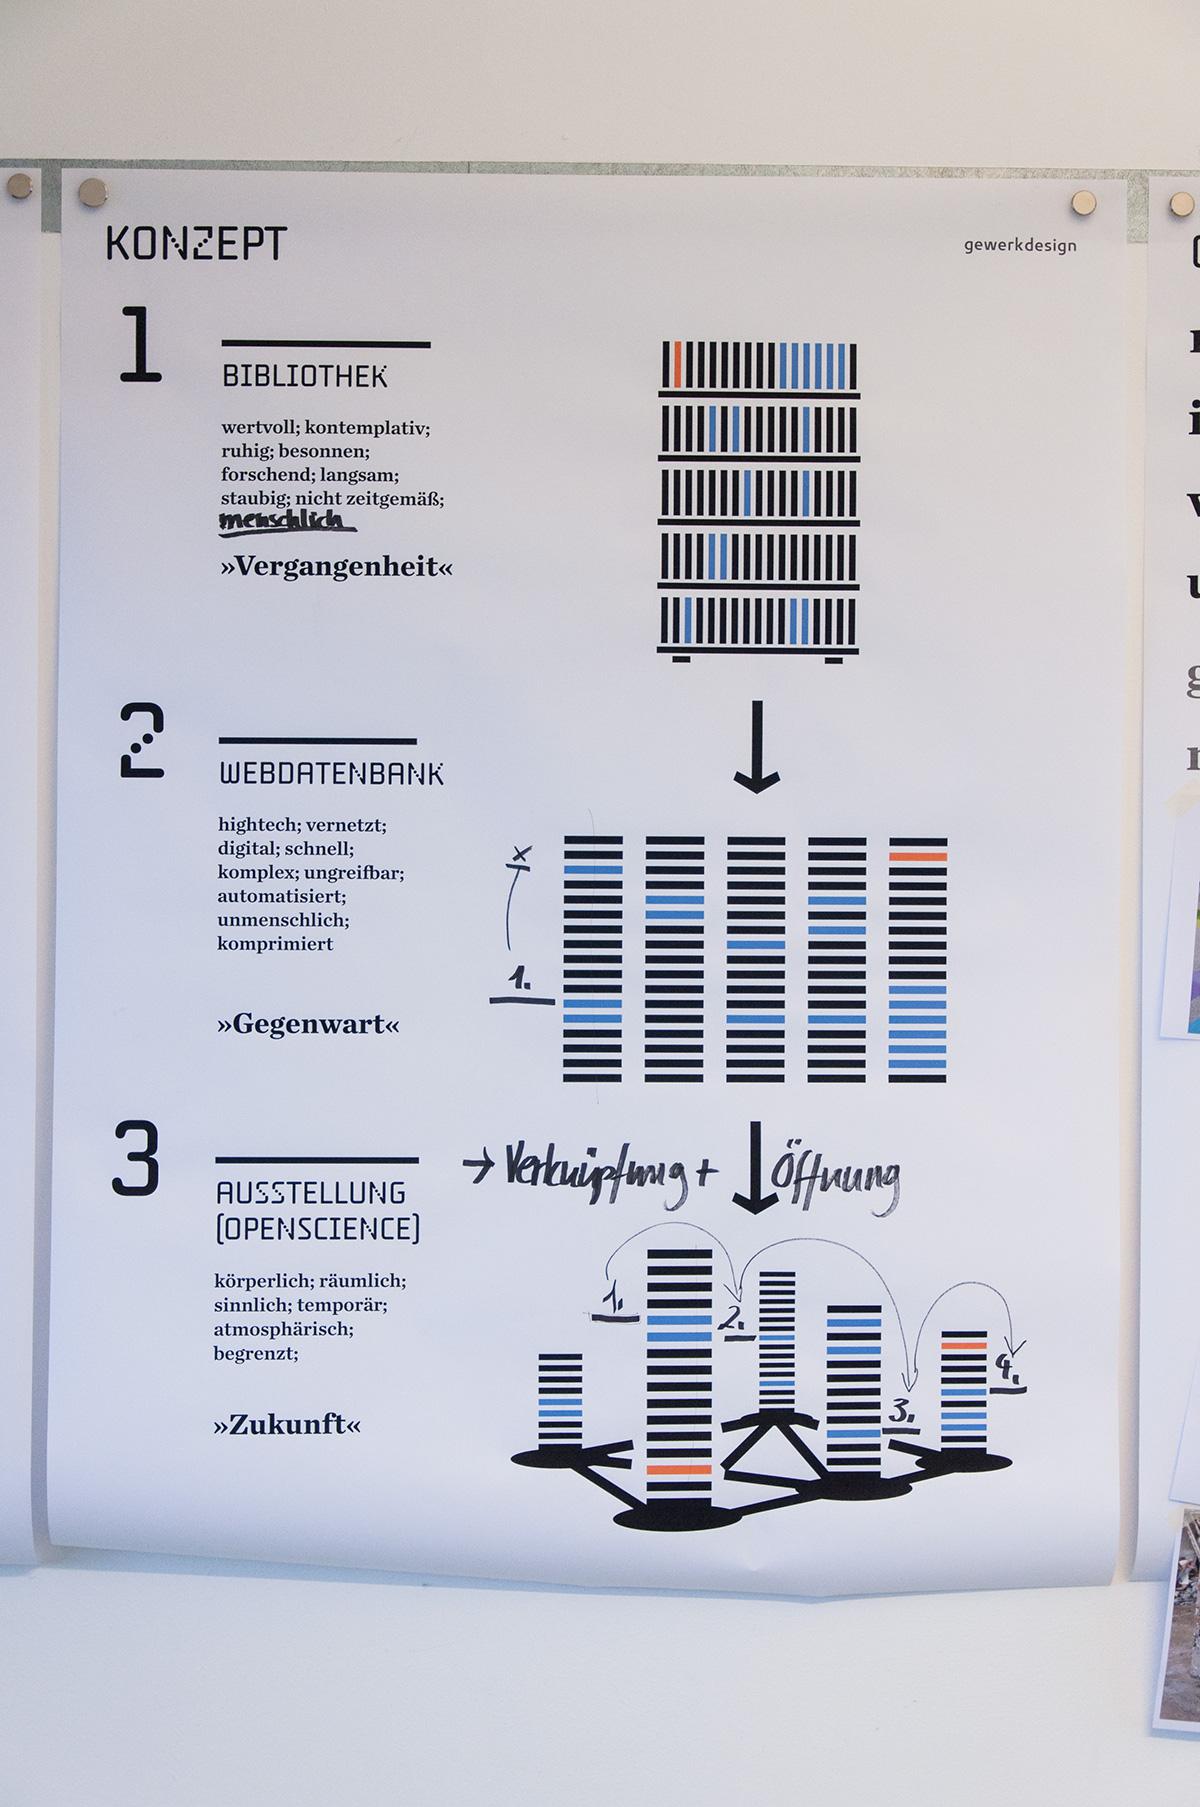 "<span class=""deutsch"">Ausstellungskonzept Herleitung der Gestaltungsidee</span><span class=""englisch"">Exhibition concept: explaining the key image</span>"